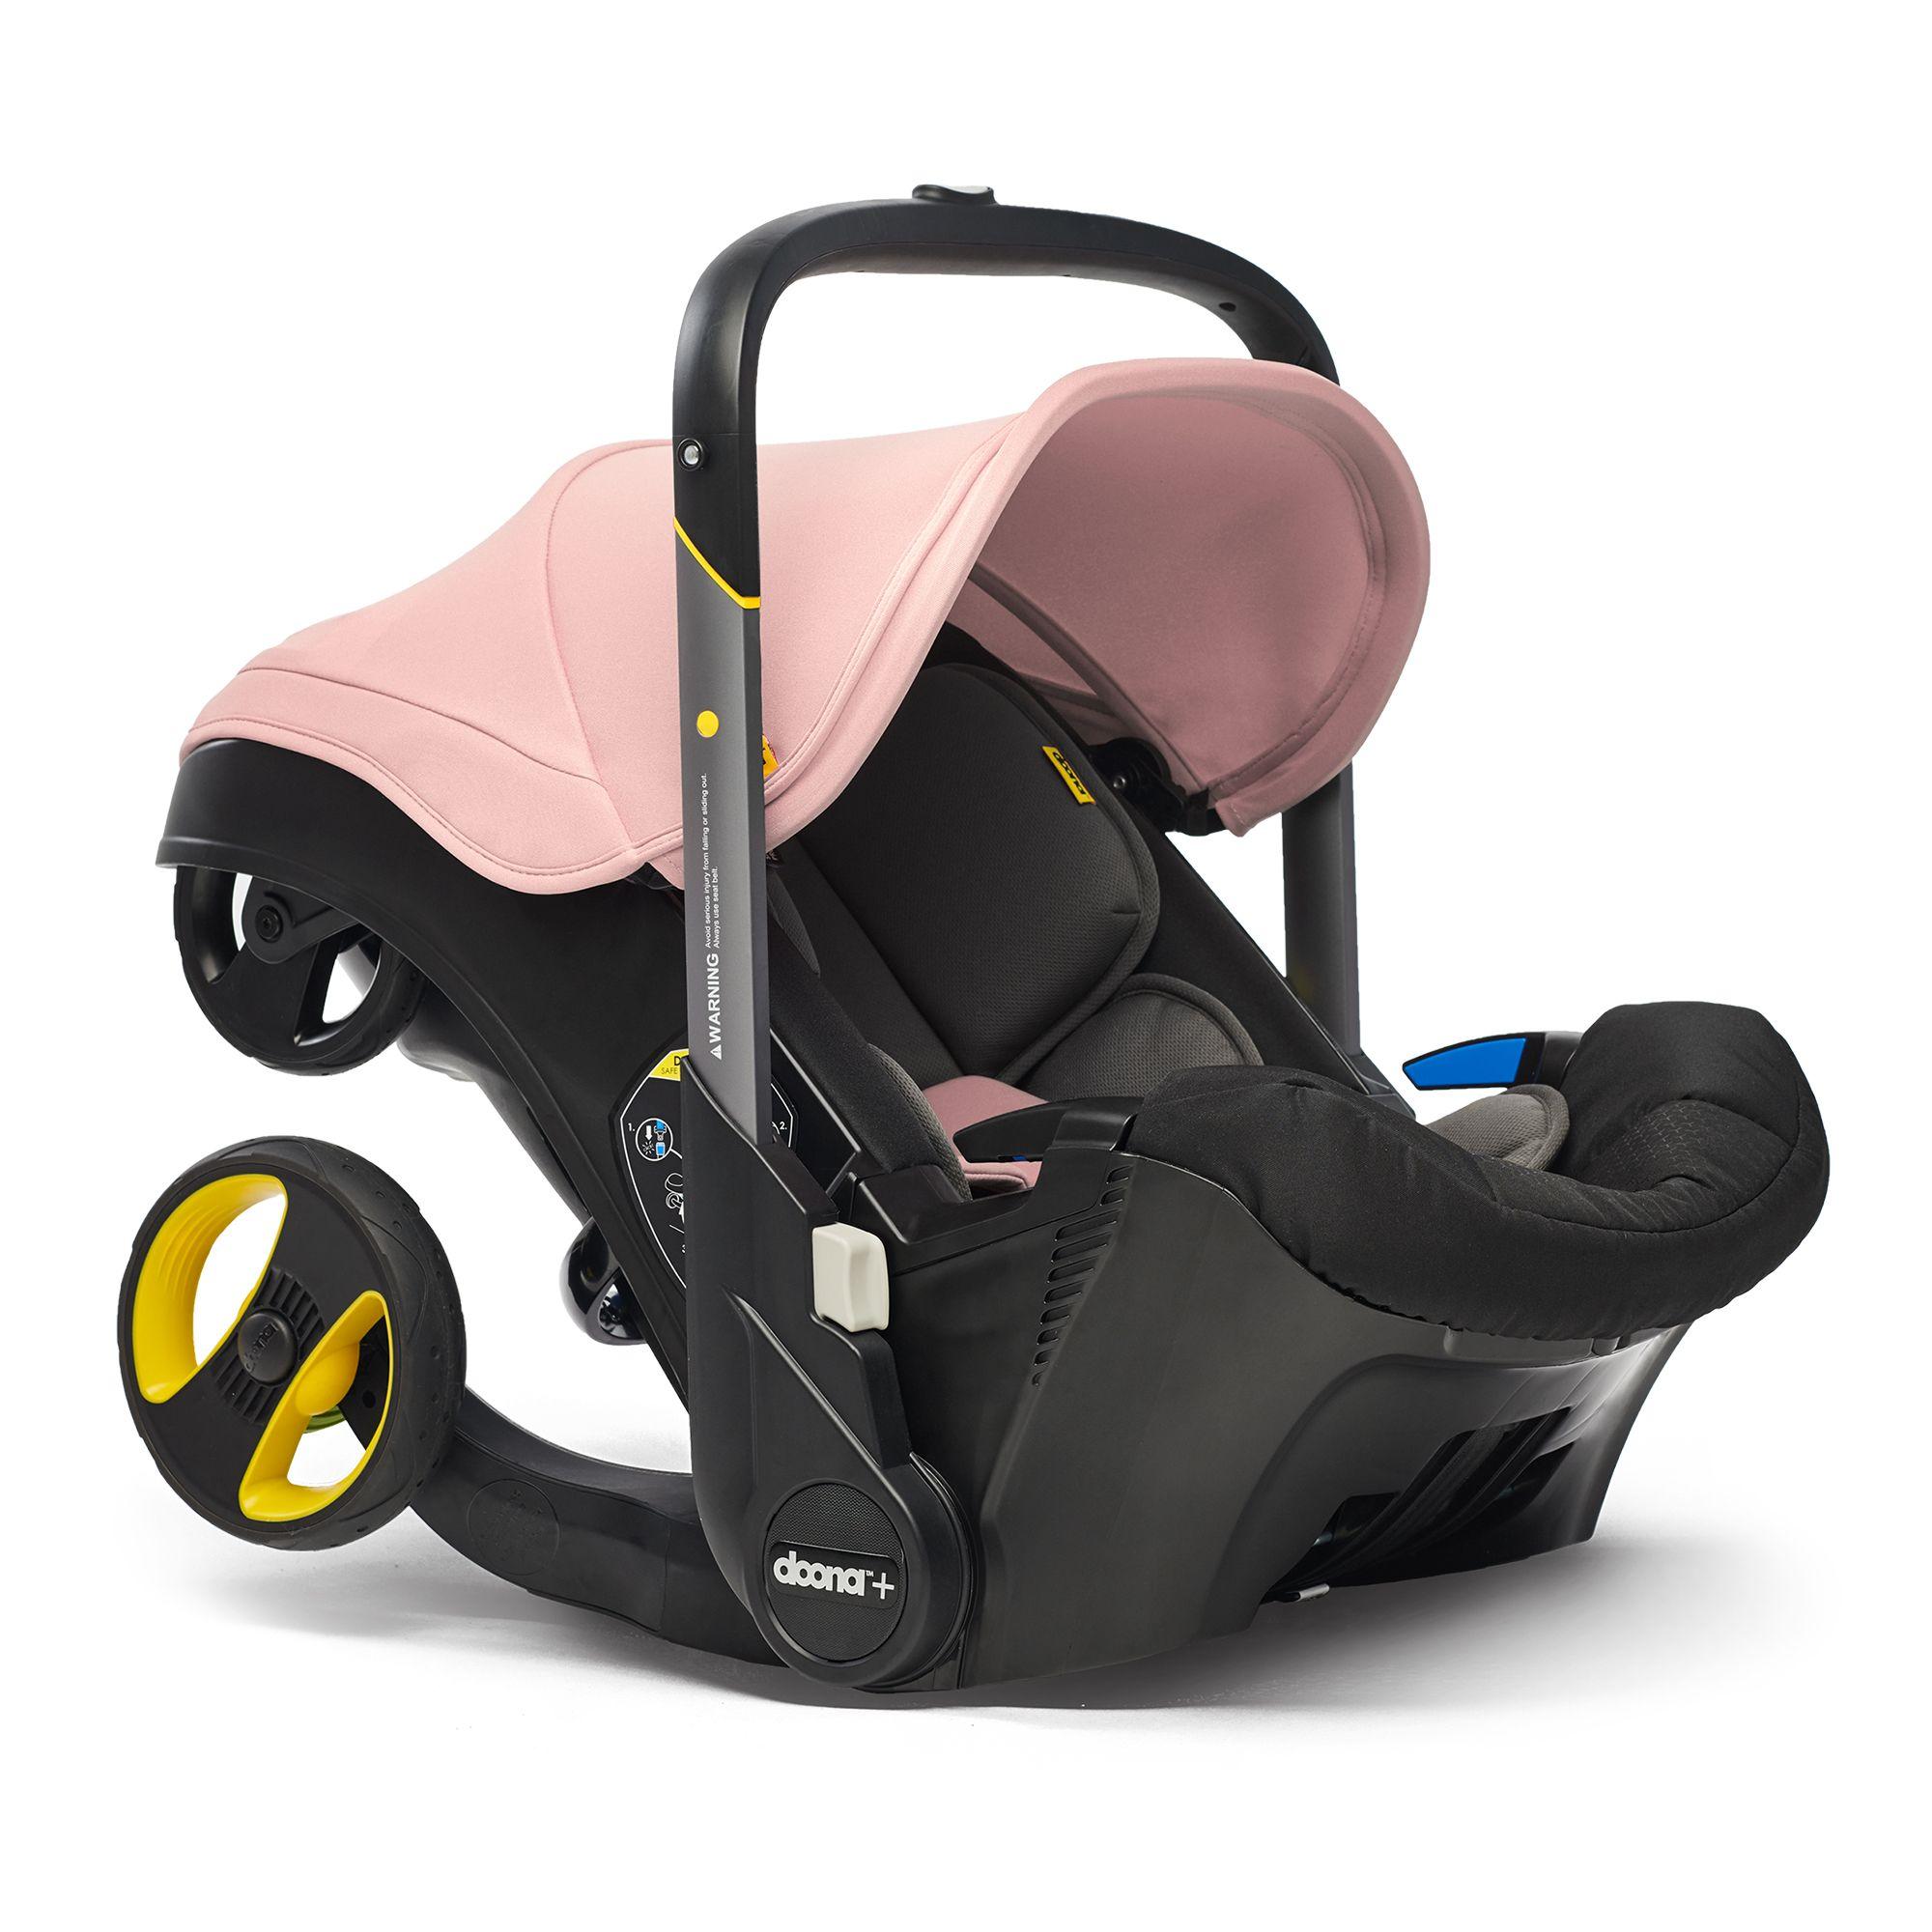 Autosedačka Doona Plus - Blush Pink